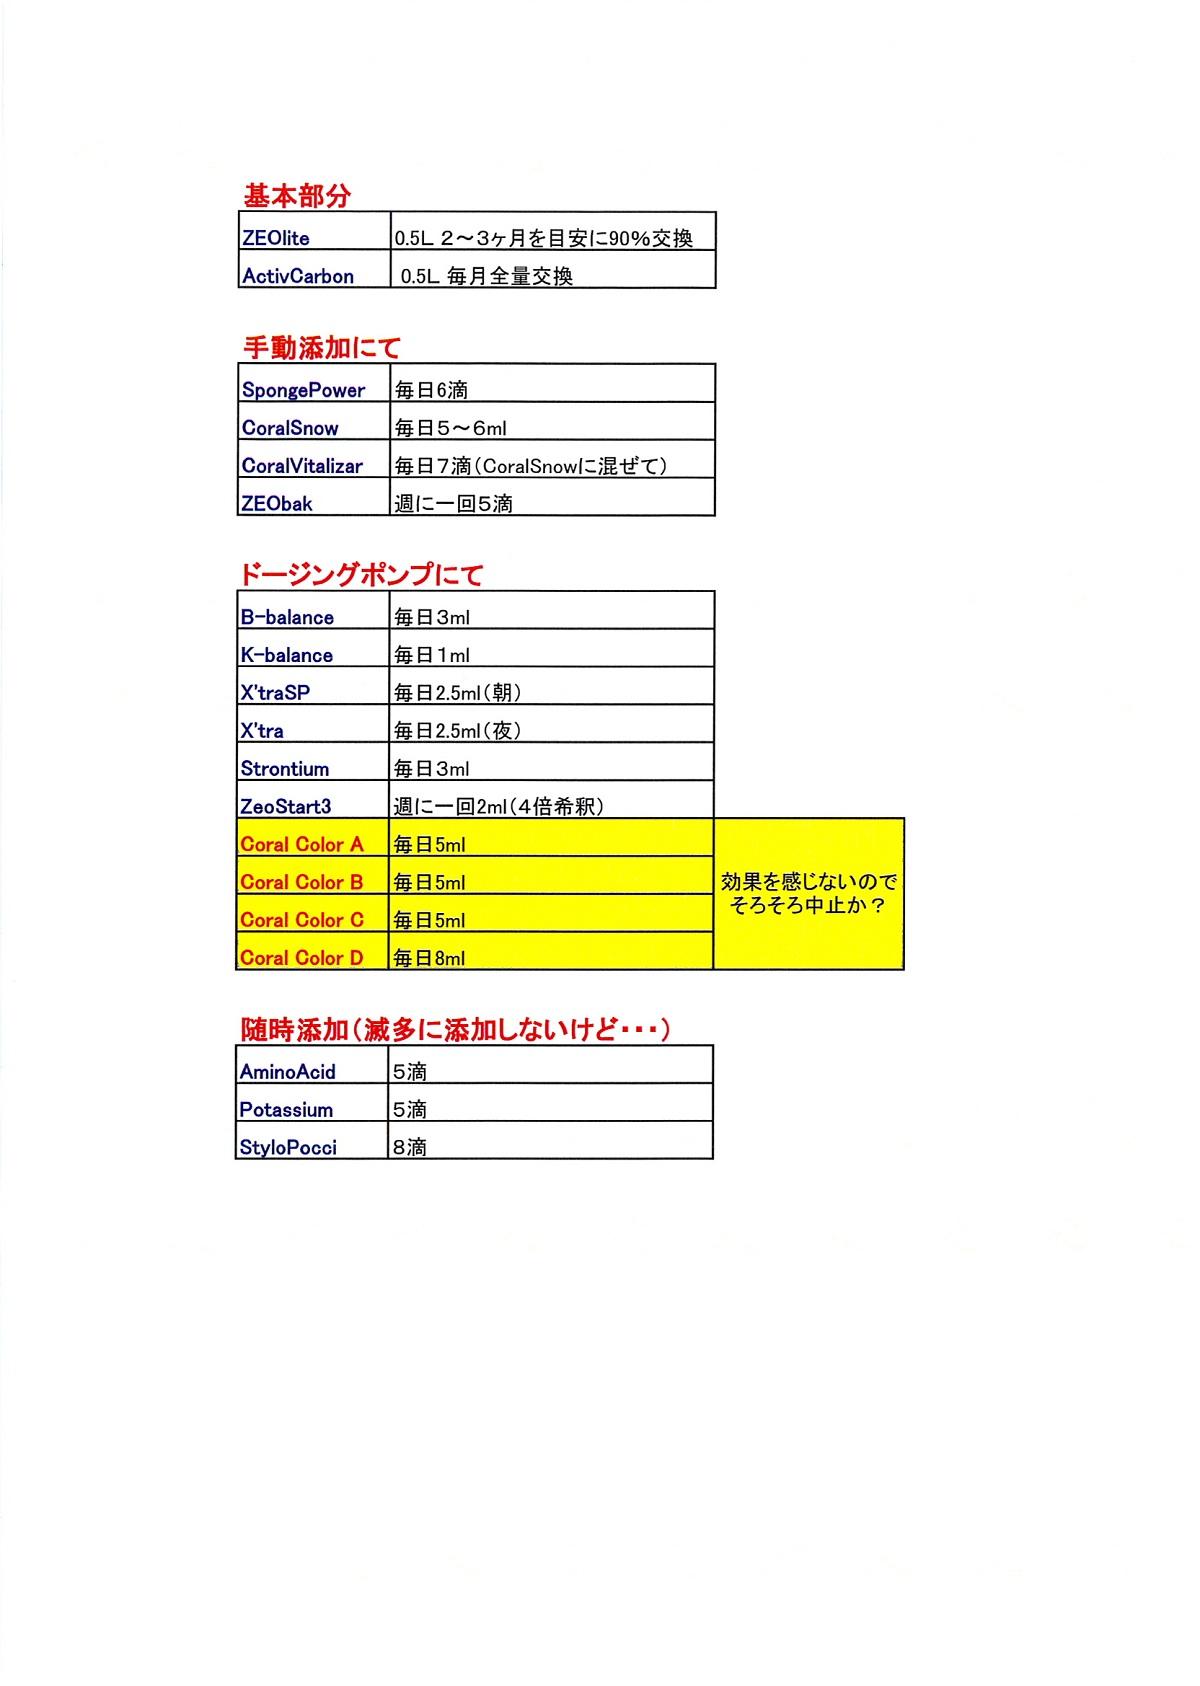 MX-2300FG_20130405_175400_001.jpg